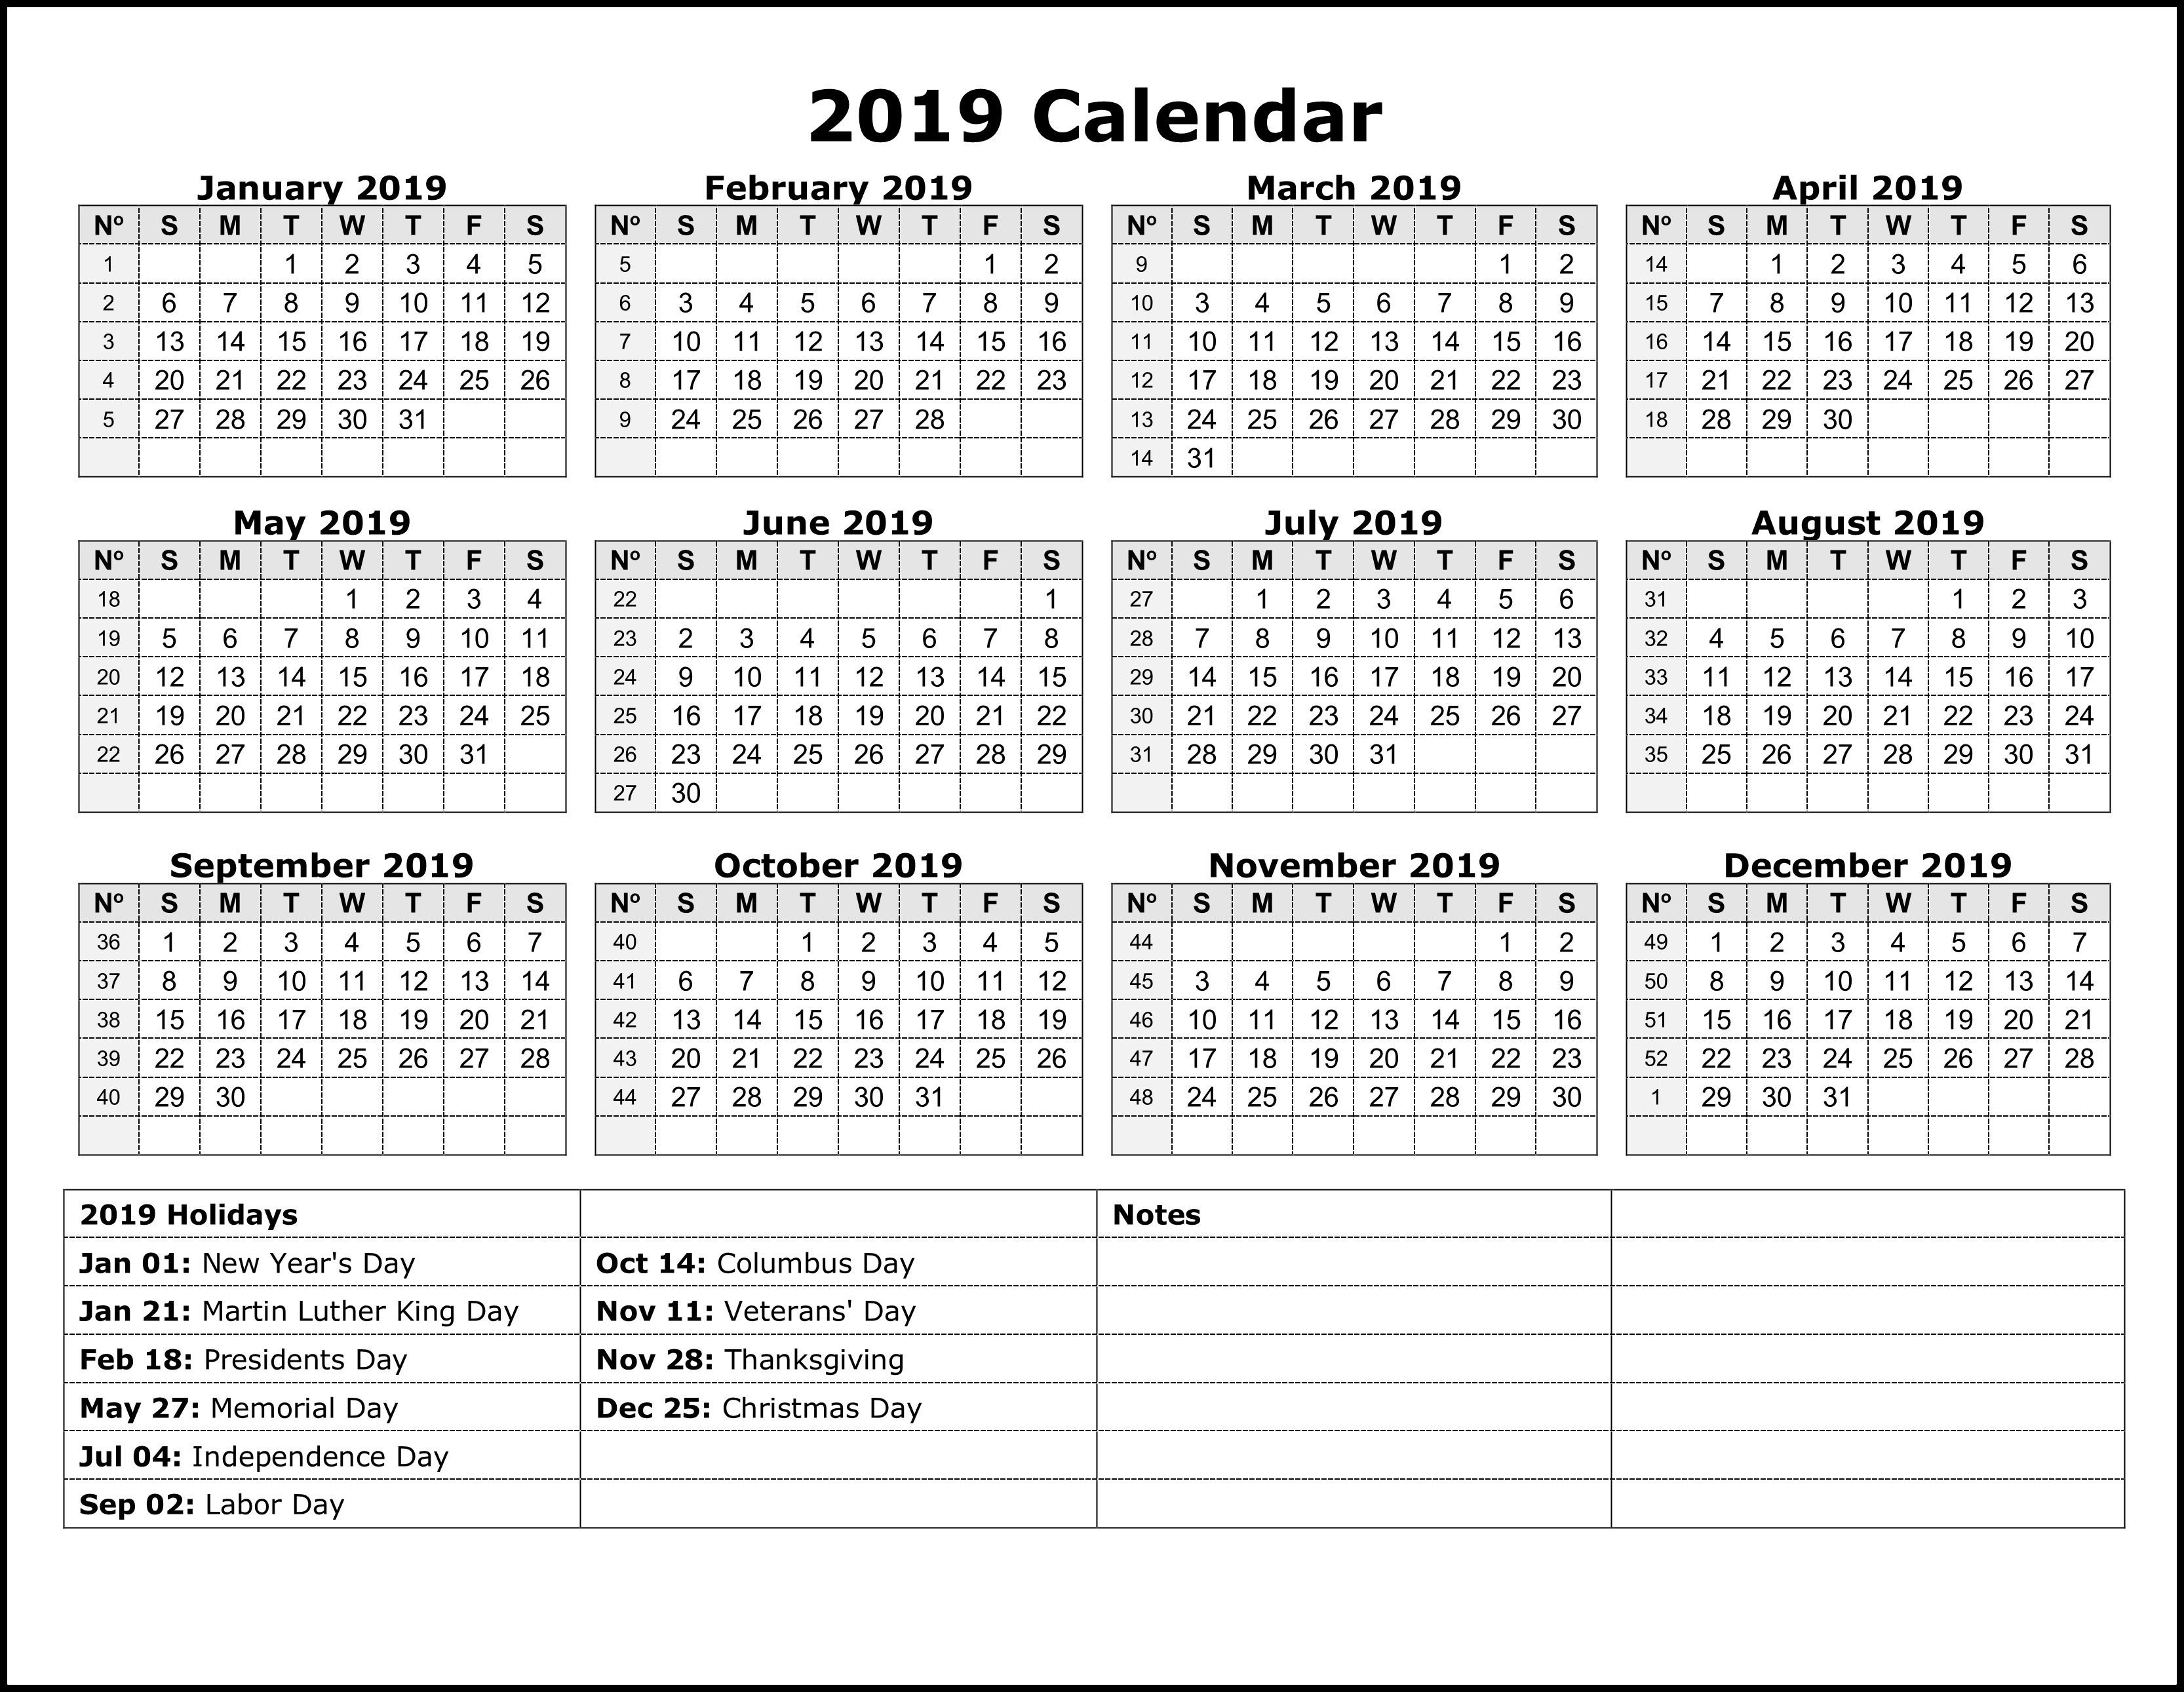 National Holiday Calendar 2019 #calendar2019 #printablecalendar Calendar 2019 With All Holidays